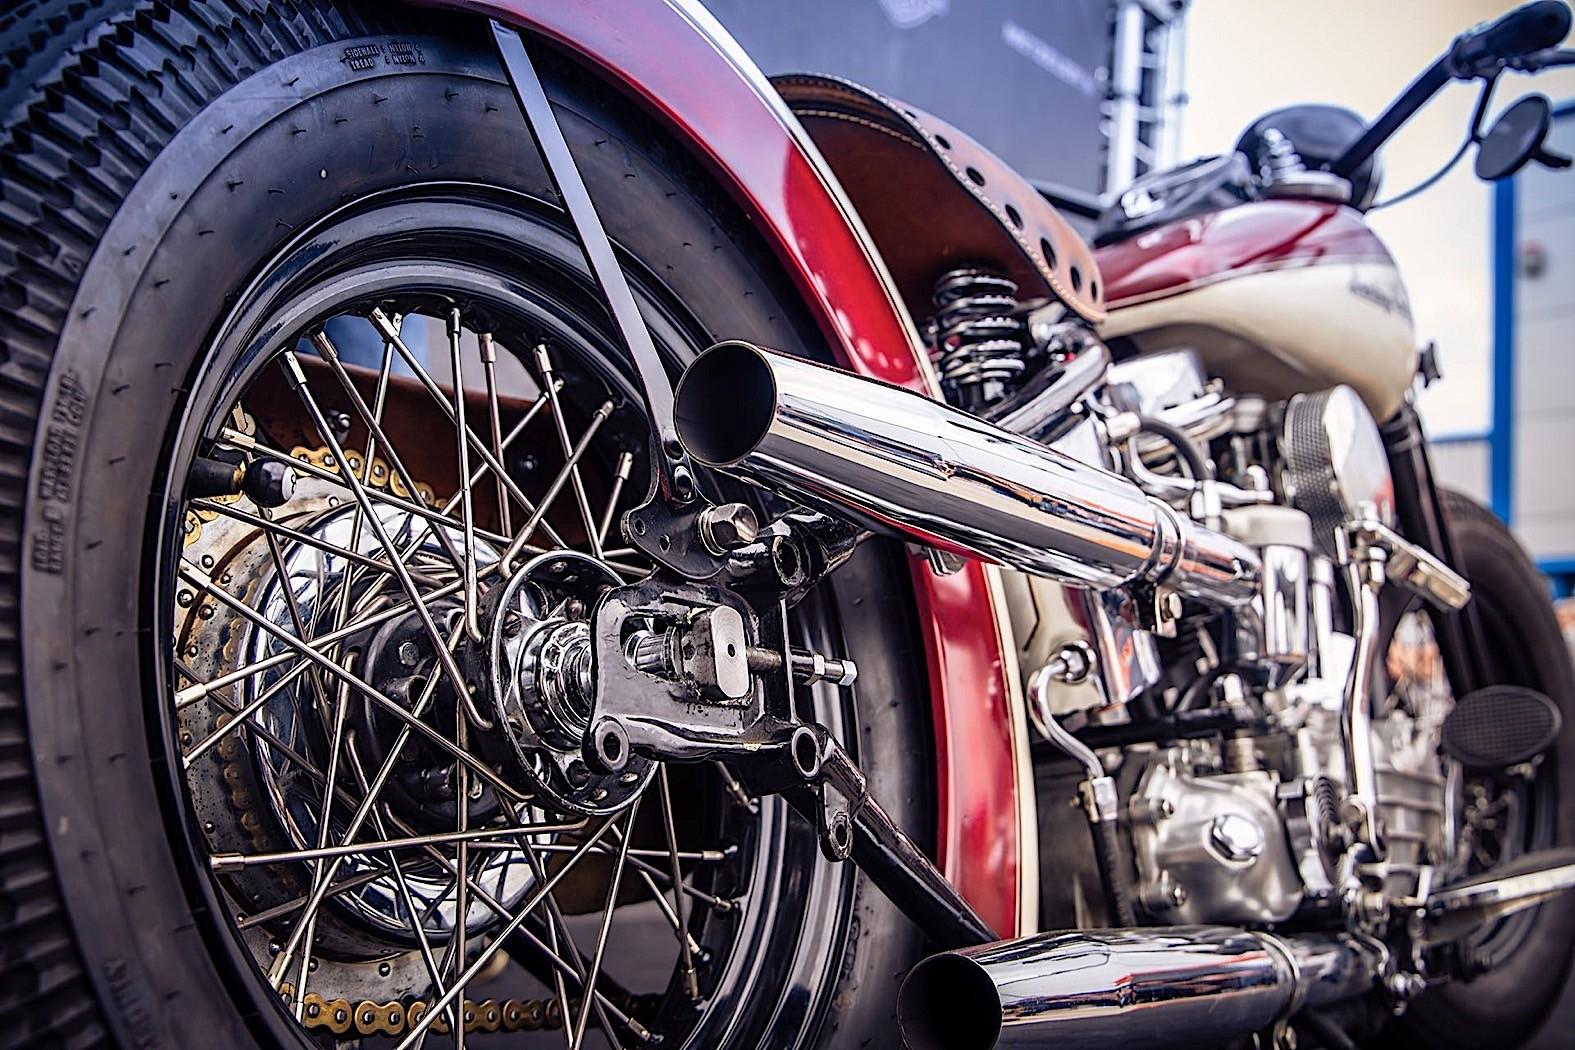 Harley-Davidson Uncle Pan Is the German Take on the American Panhead